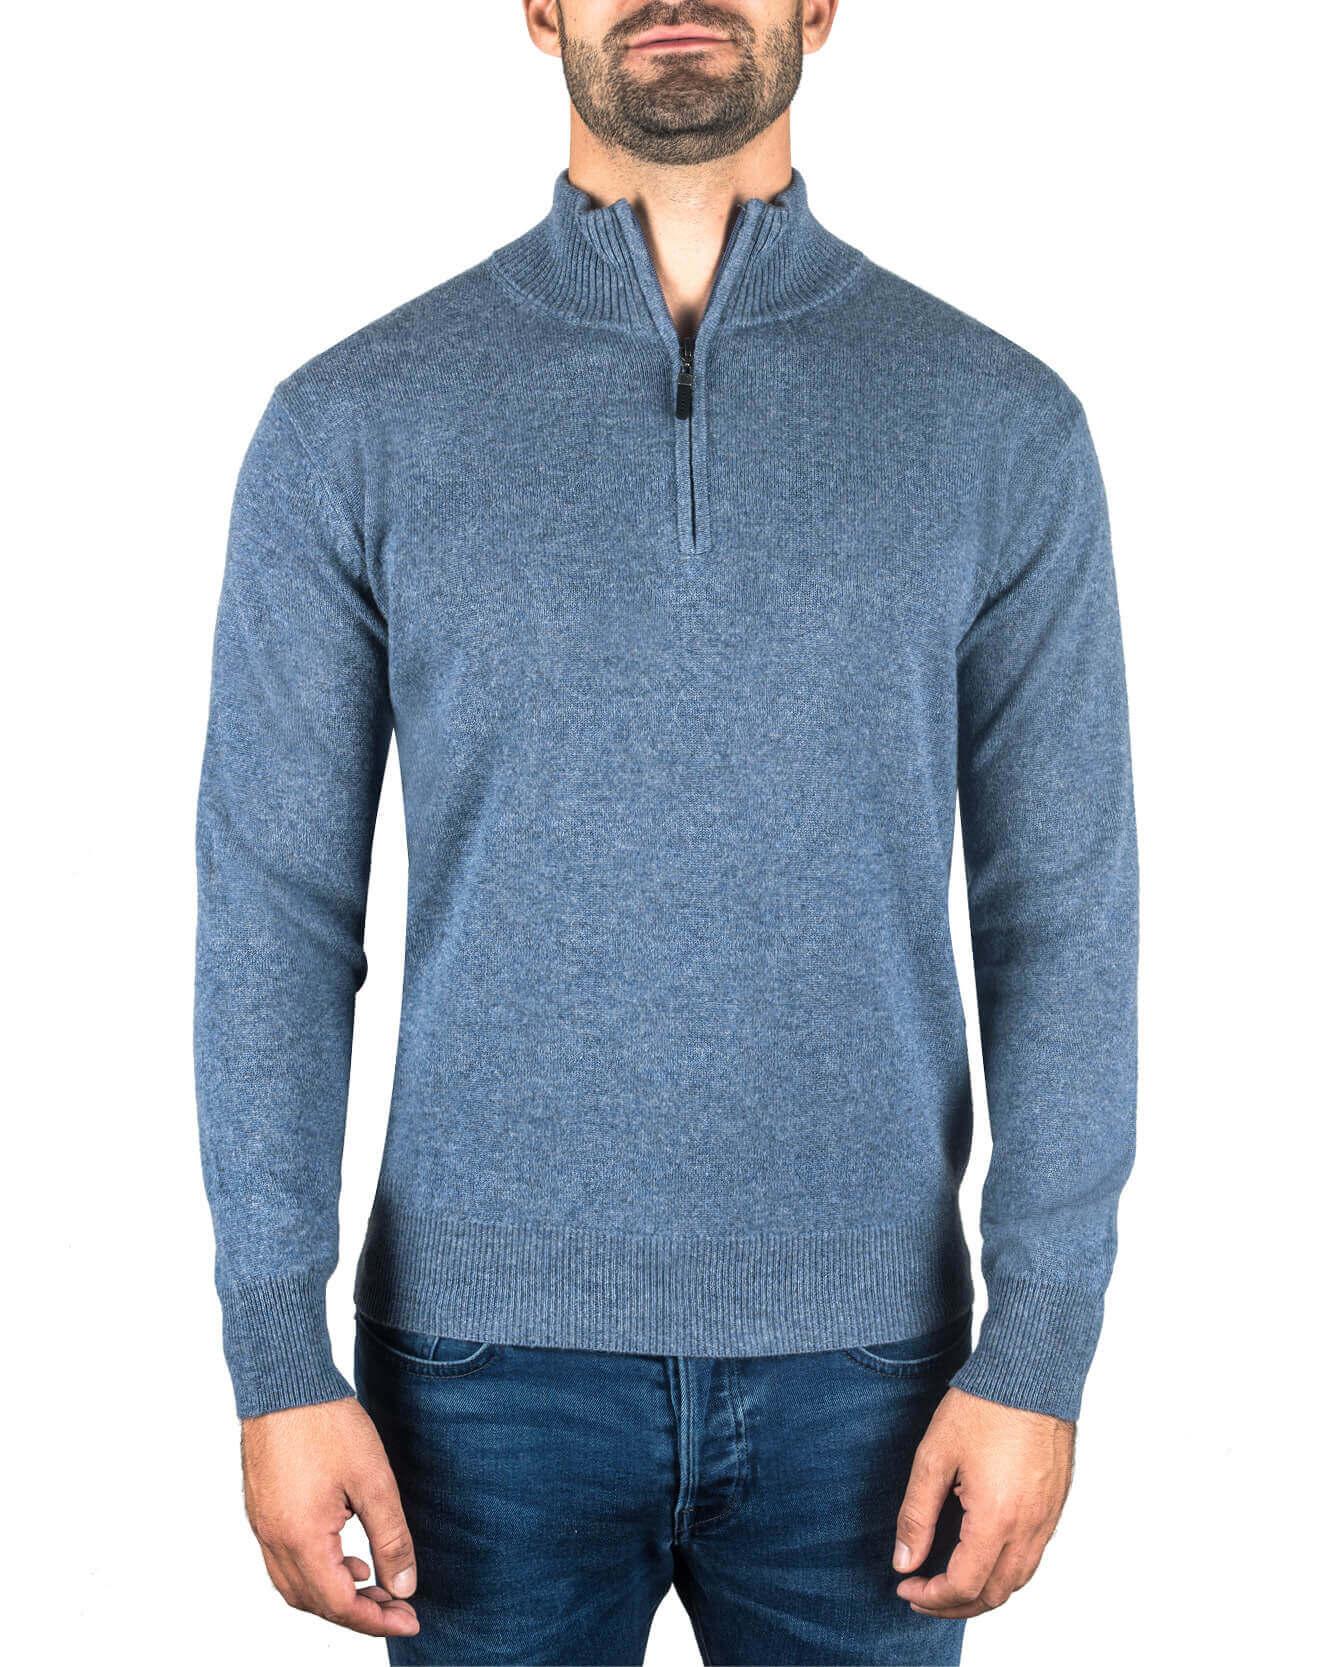 letzter Rabatt Luxus-Ästhetik meistverkauft Kaschmir Stehkragen Pullover jeans blau